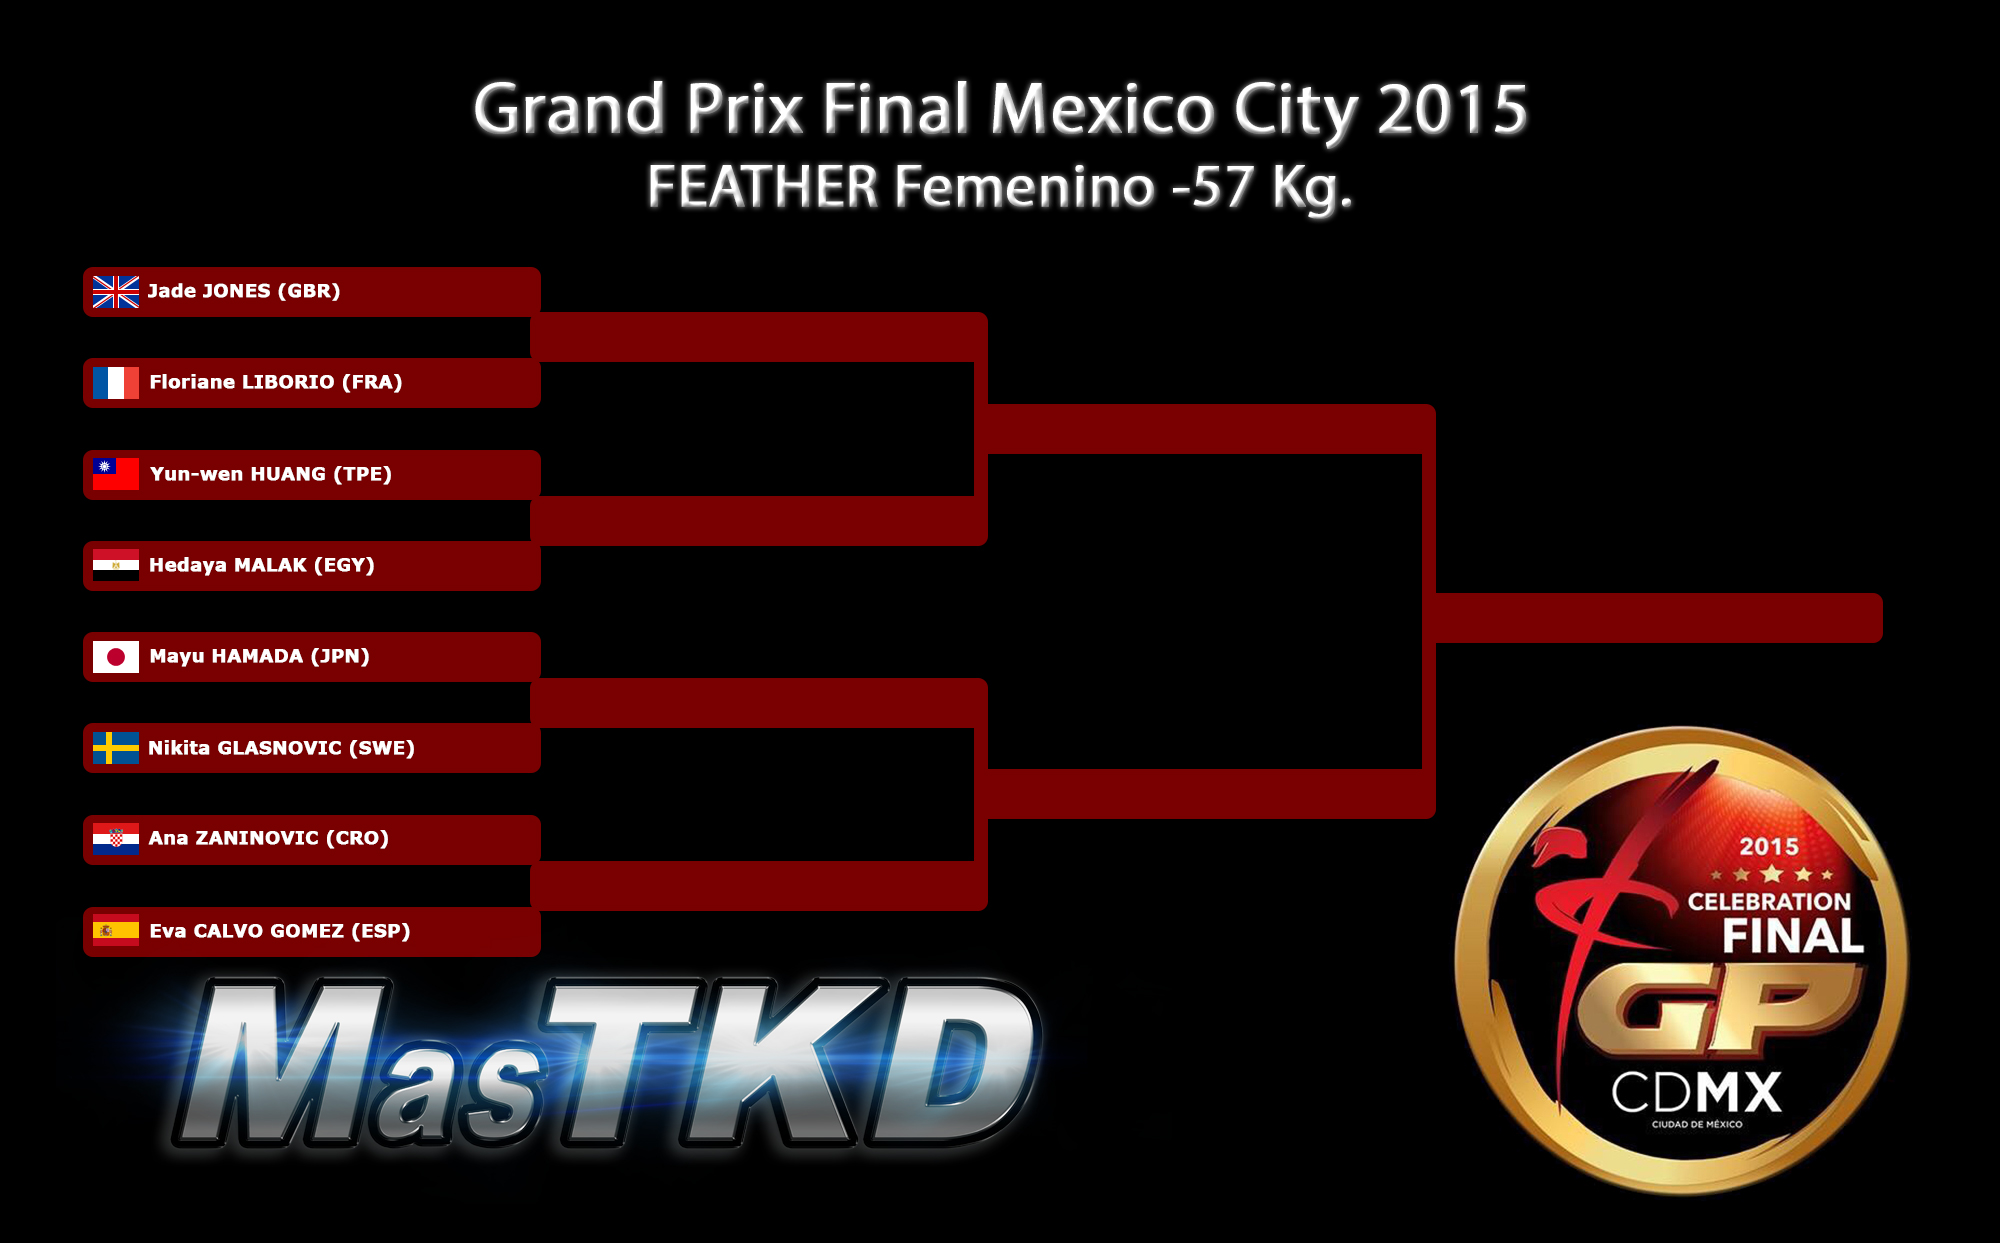 F-57_Grafica_GPFinal_MexicoCity2015